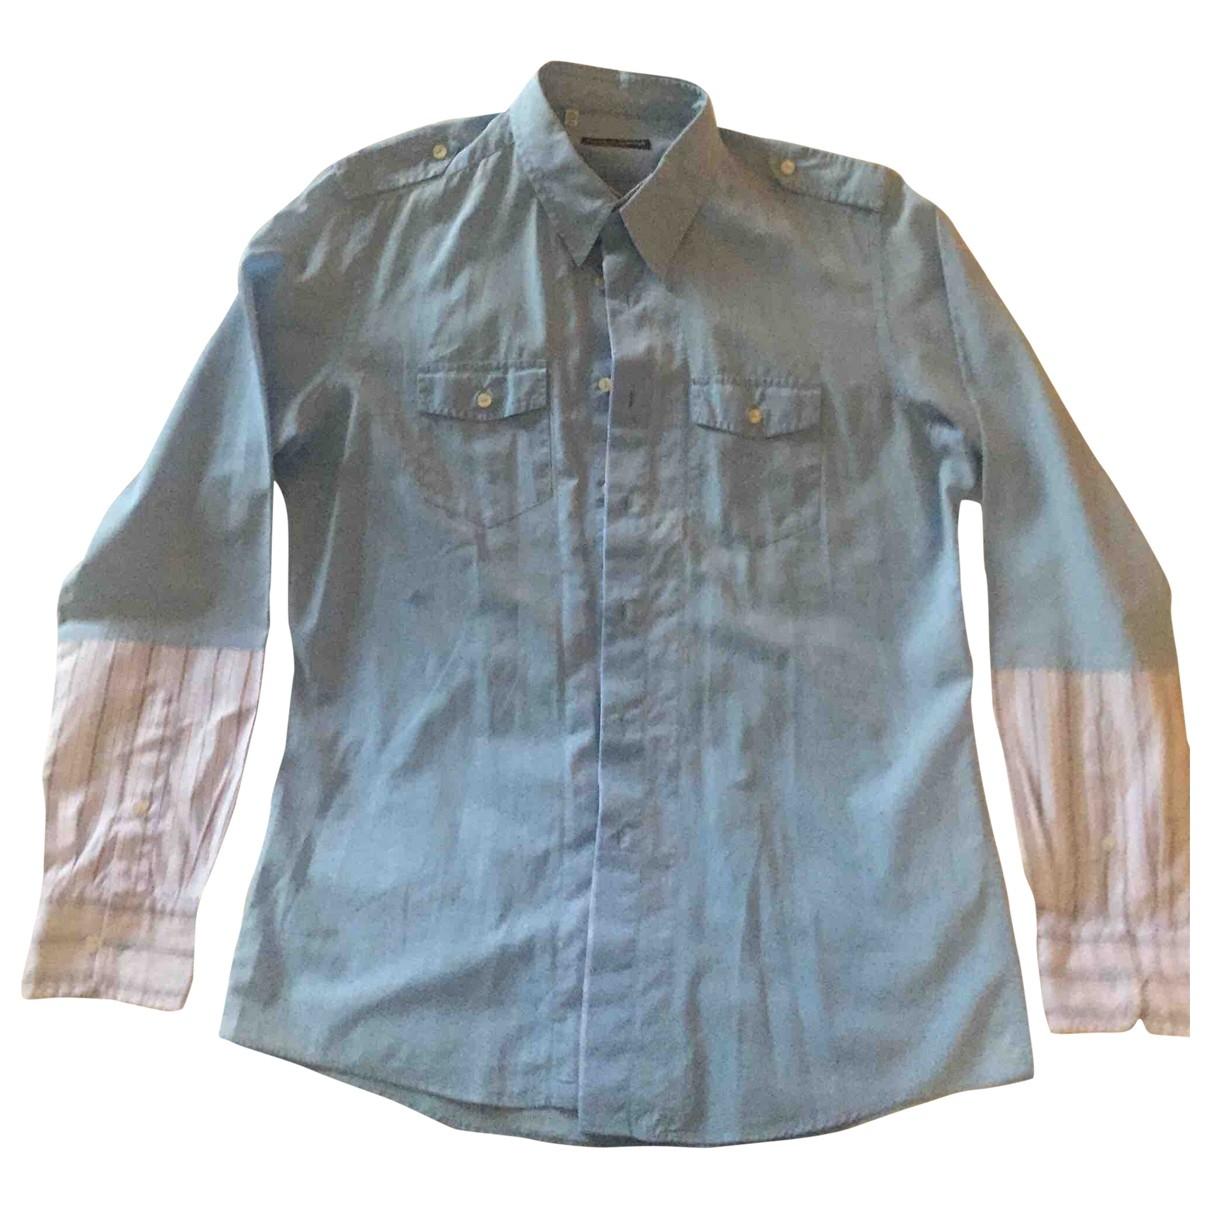 Dolce & Gabbana \N Blue Cotton Shirts for Men 44 EU (tour de cou / collar)